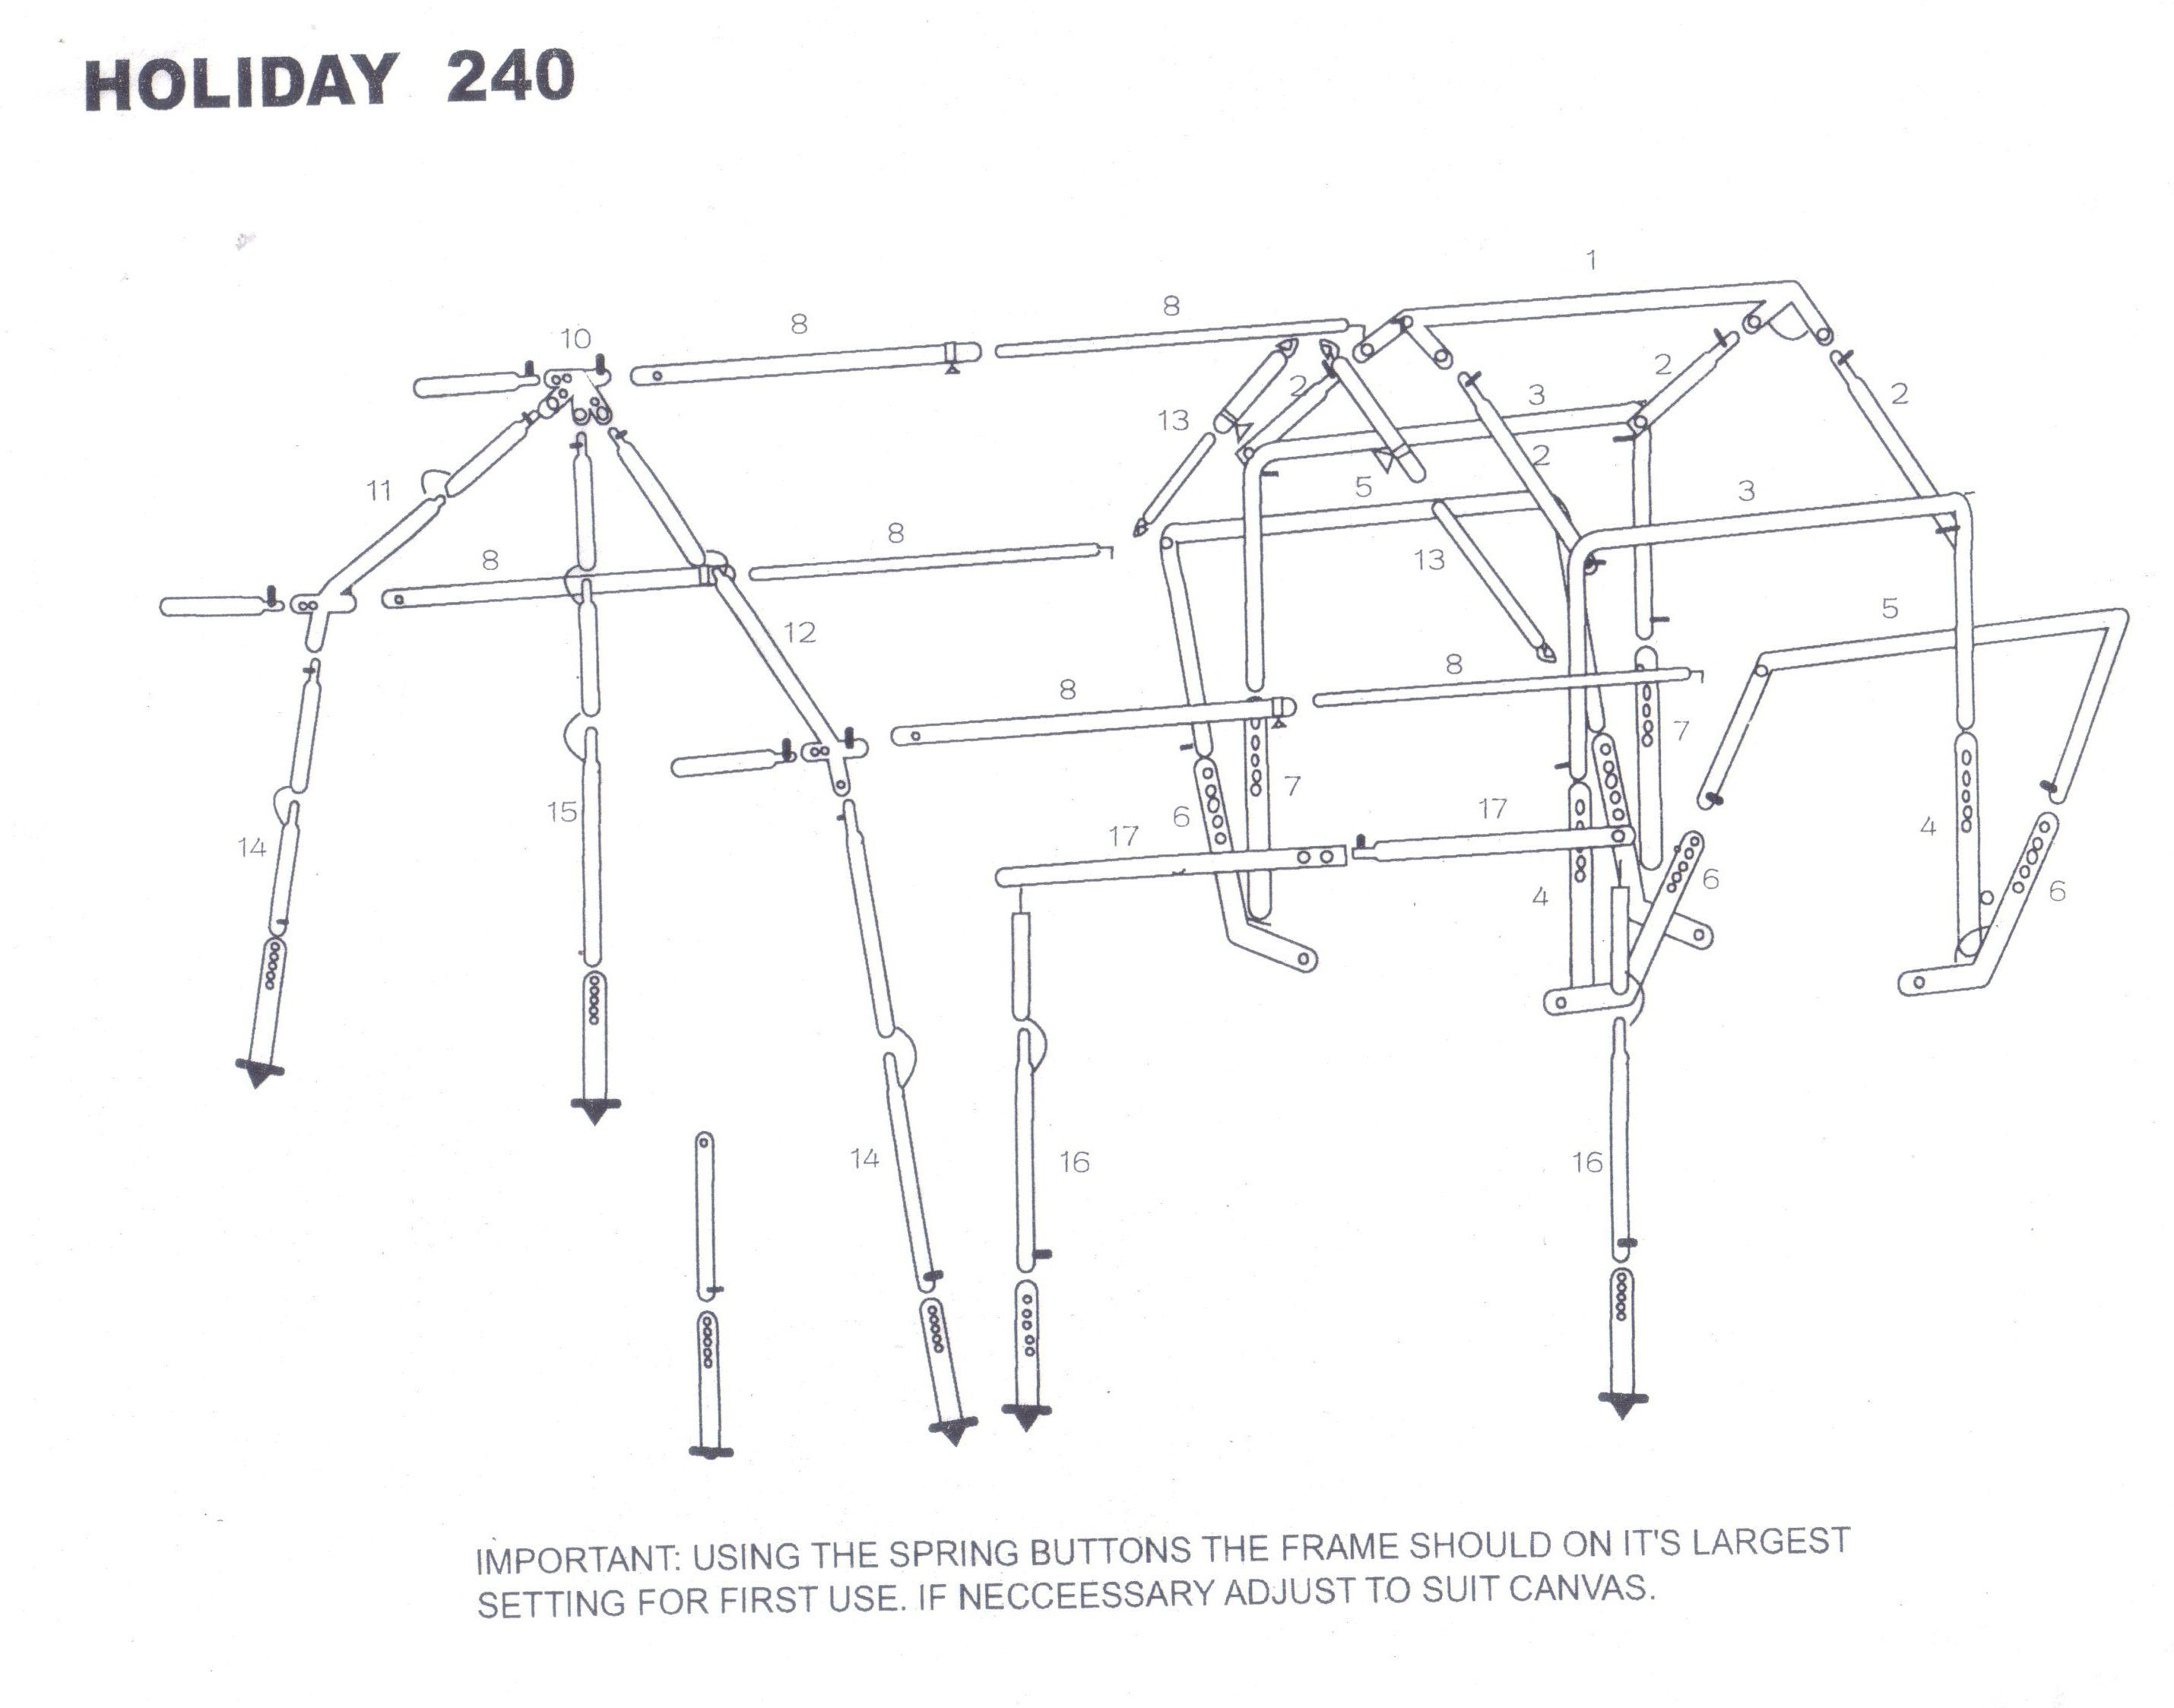 sunncamp-240-trailer-tent-awning-diagram.jpg (2860×2247) | Trailer ...